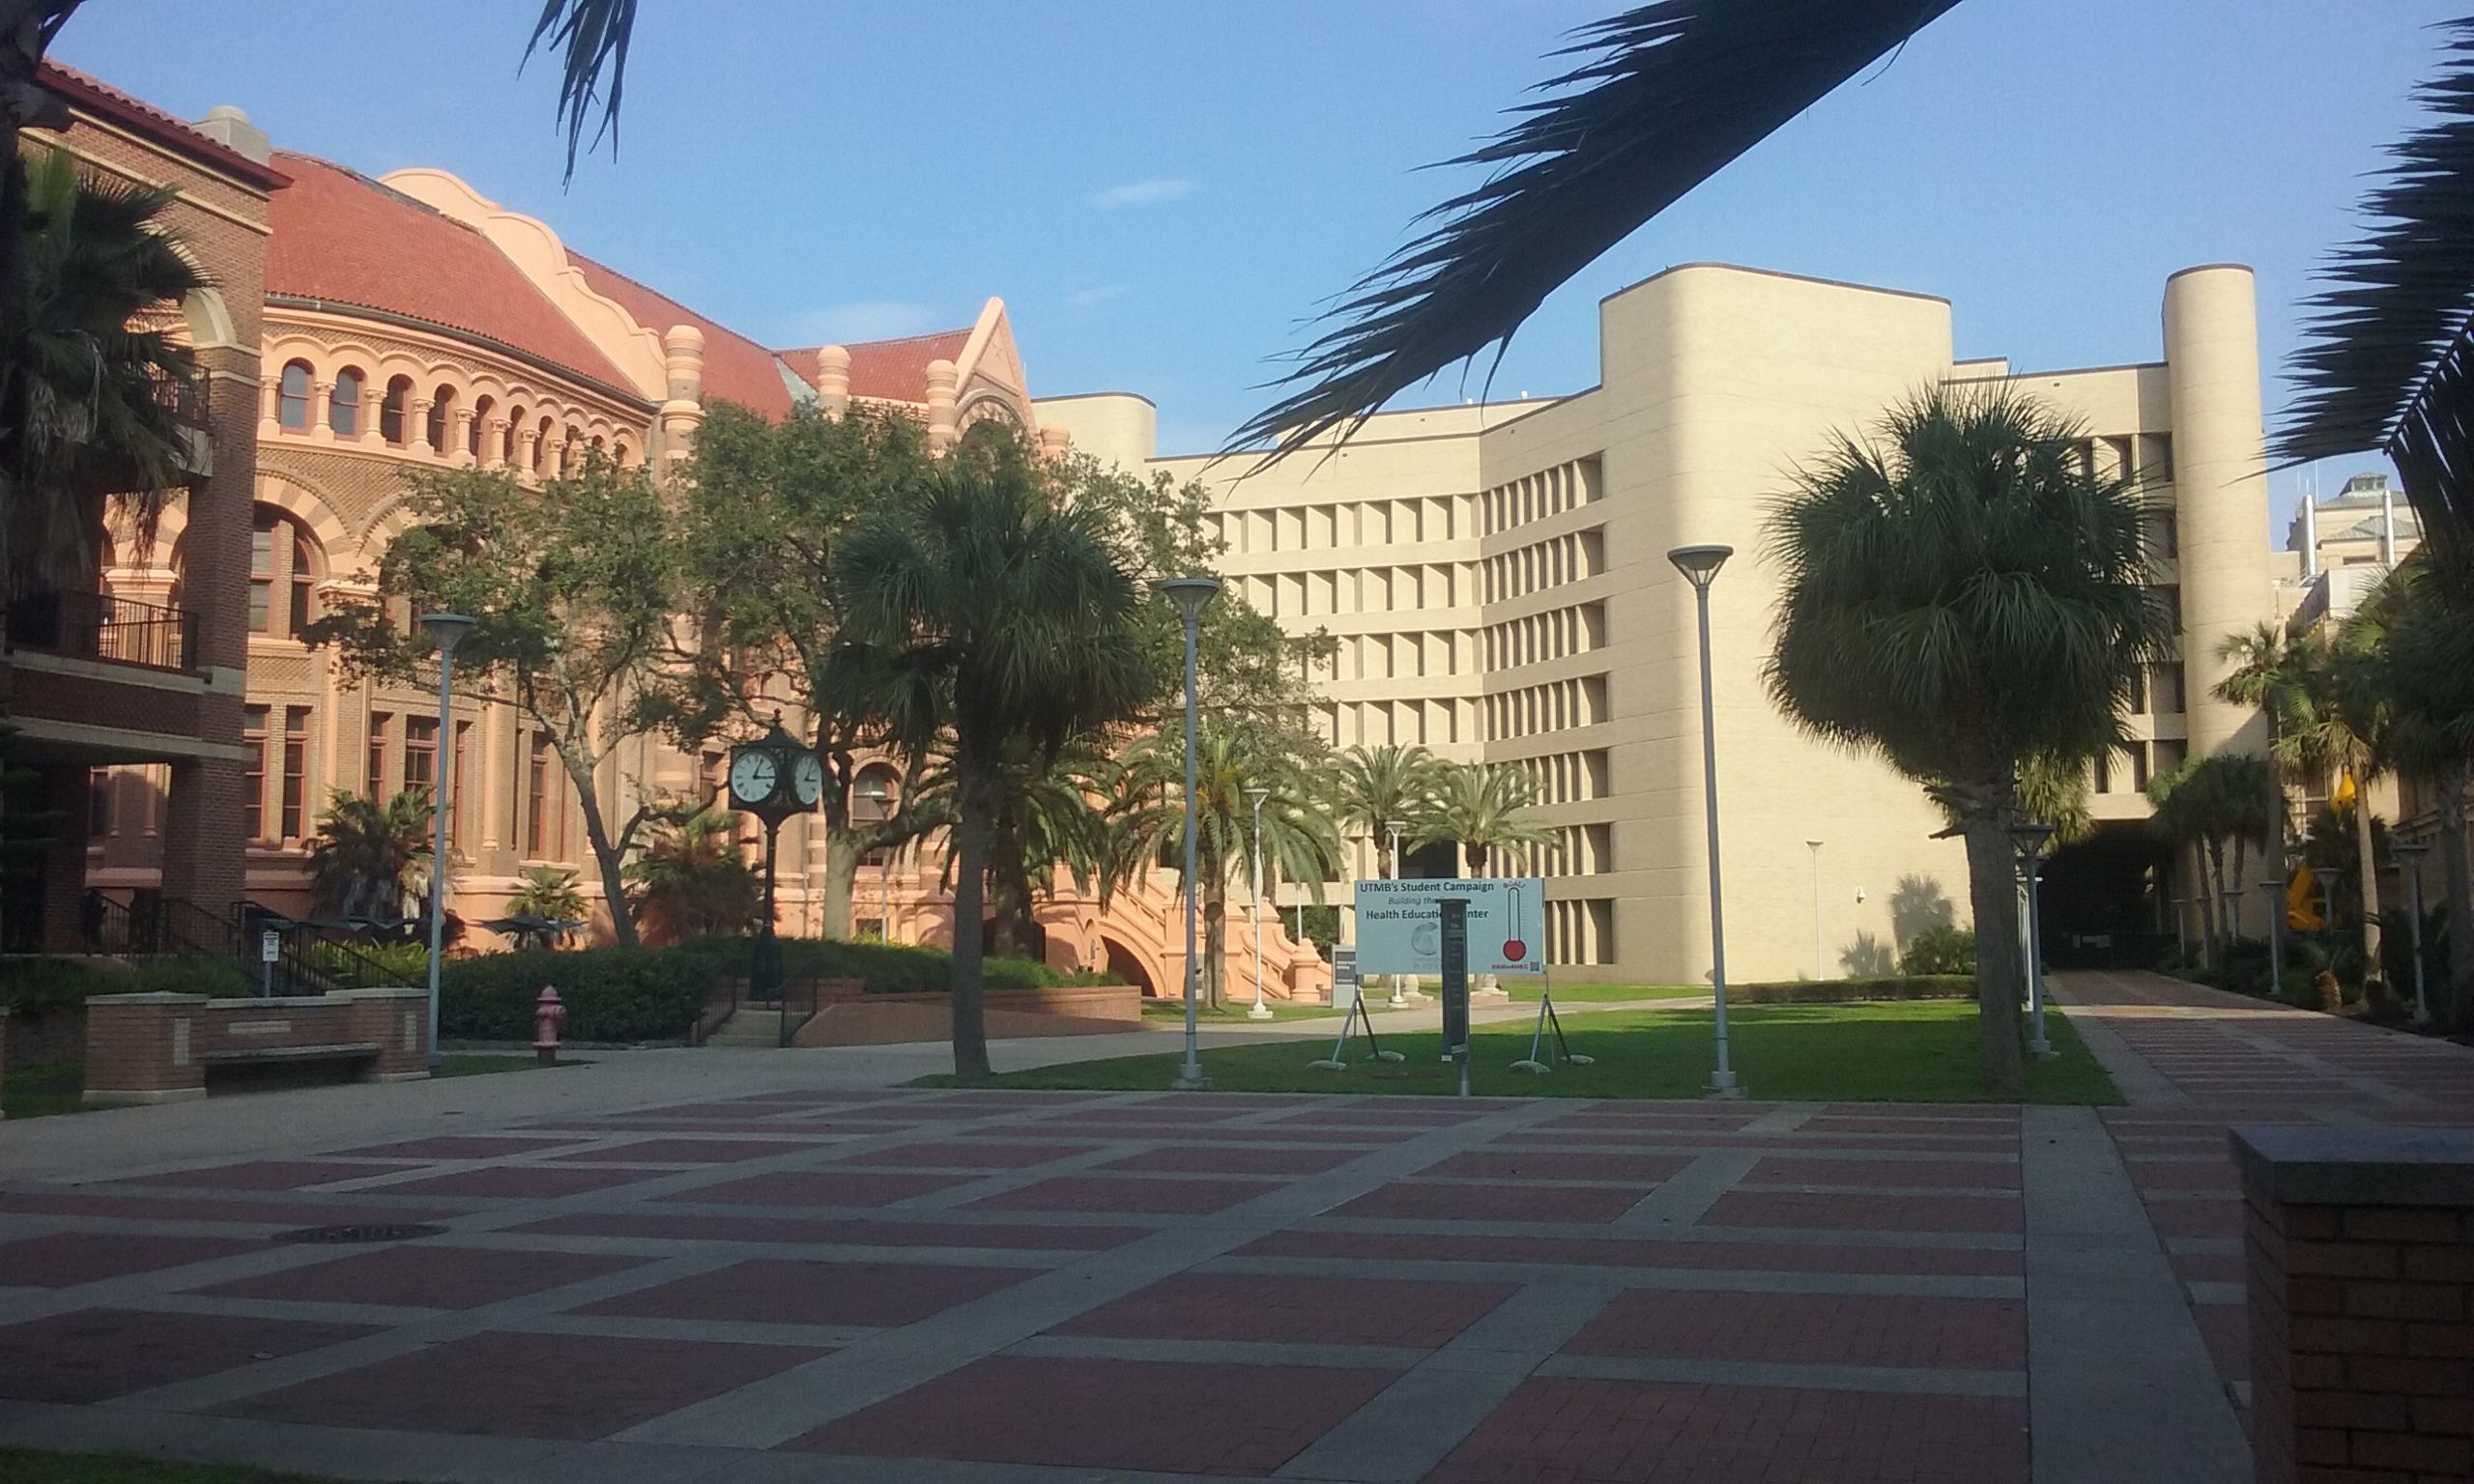 University of Texas Medical Branch, Galveston 2017 | Travel